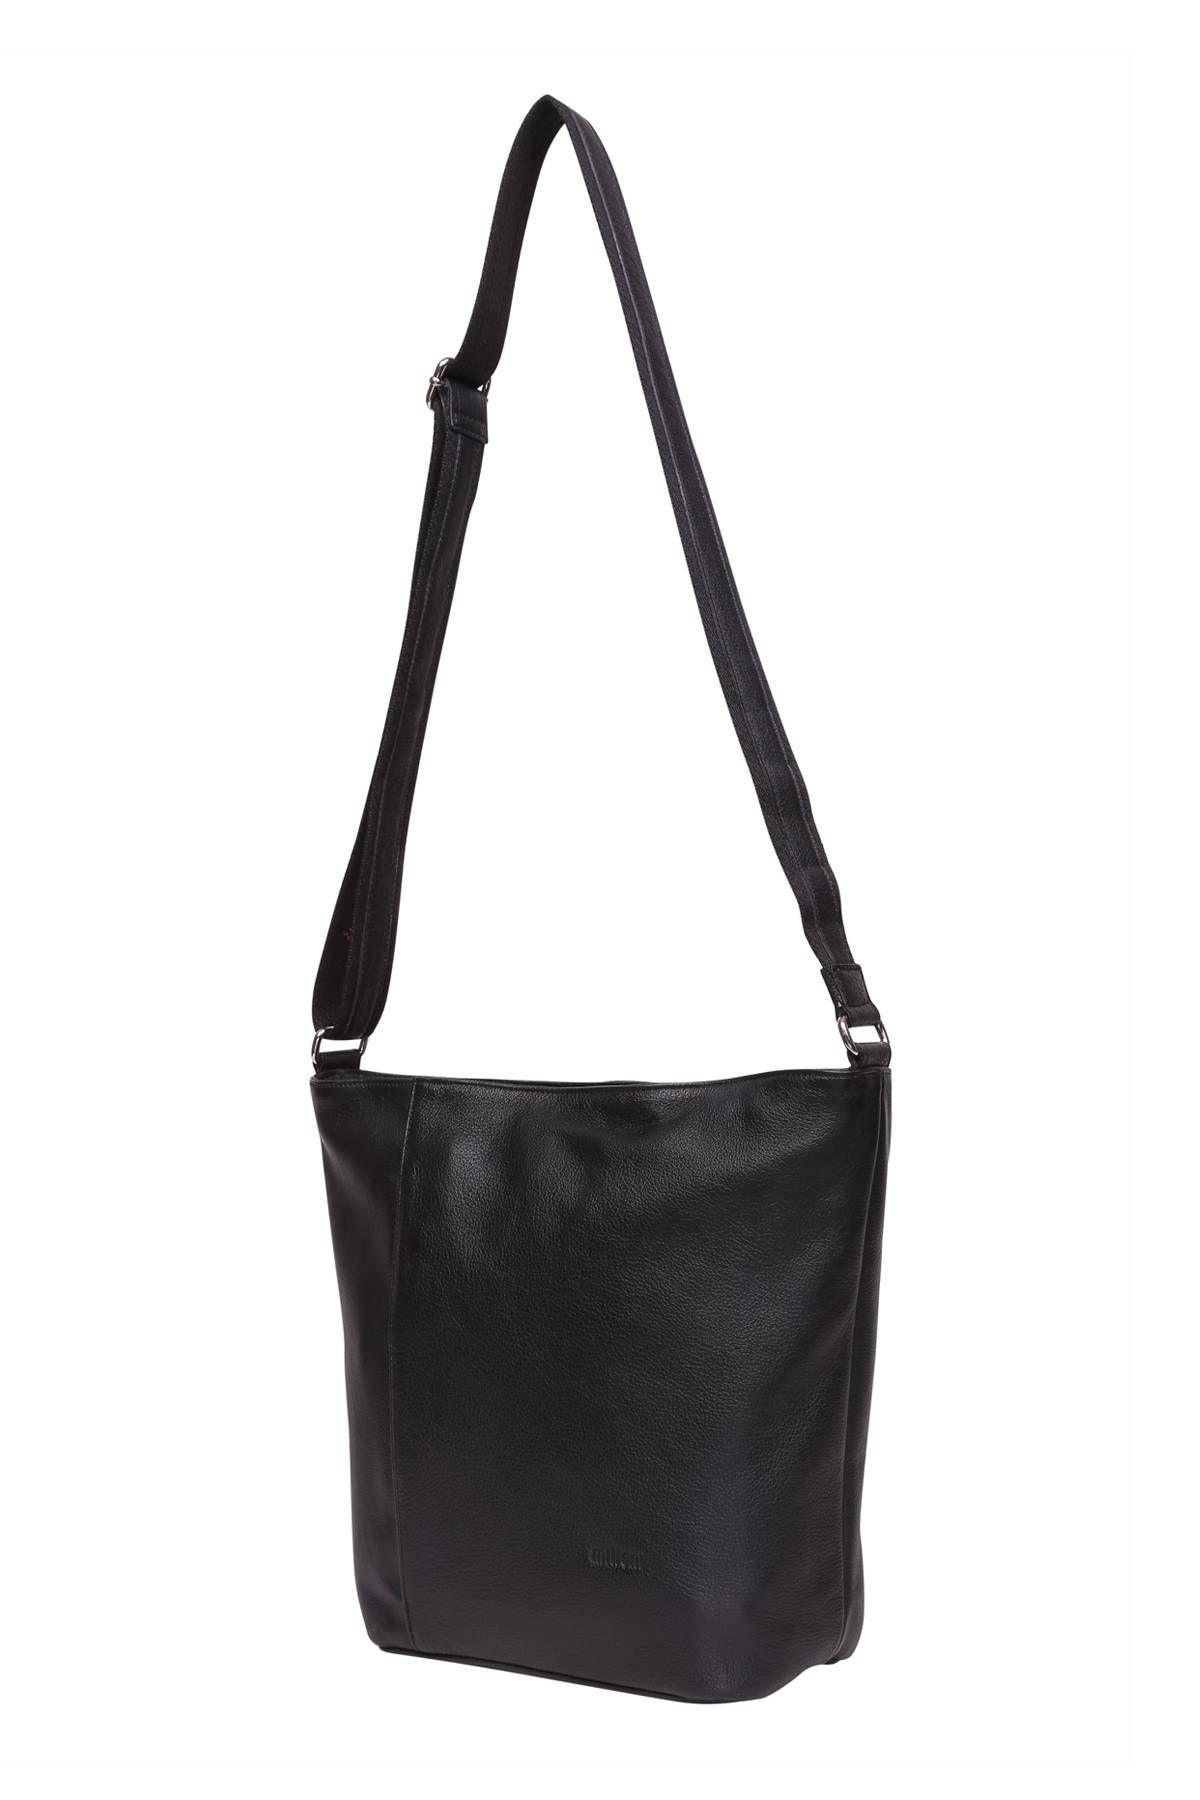 Handbags Online Milleni Vachetta Cross Body Leather Bag Victoria Station